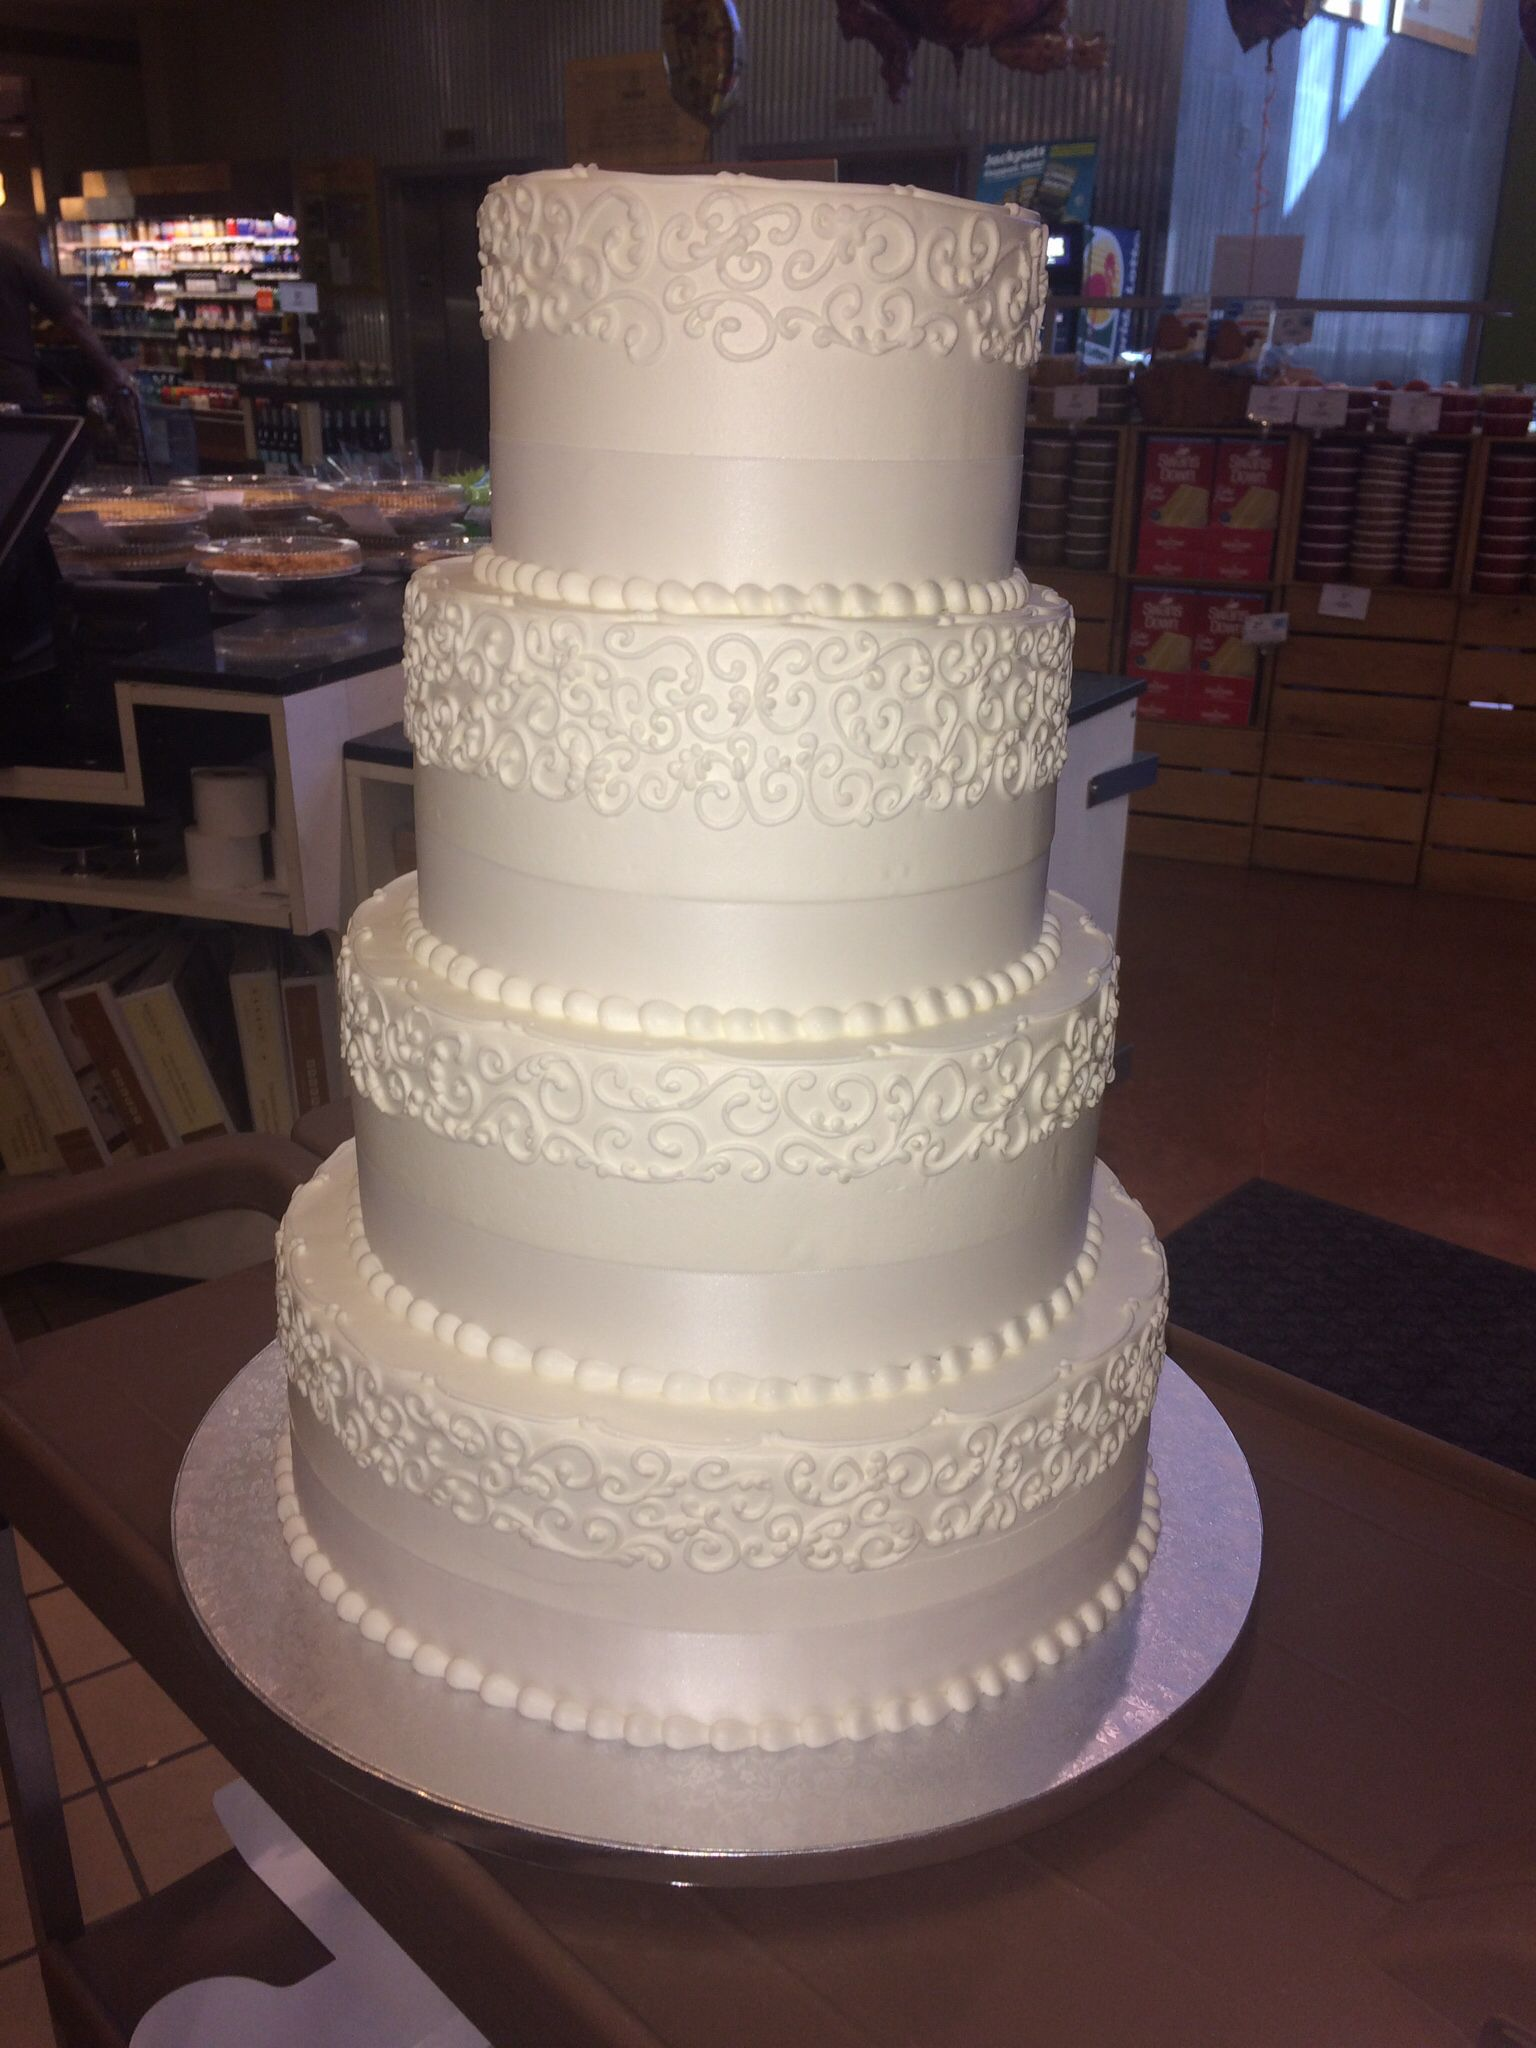 Publix GreenWise Wedding Cake Hyde Park Tampa FL Wedding - Publix Wedding Cake Price